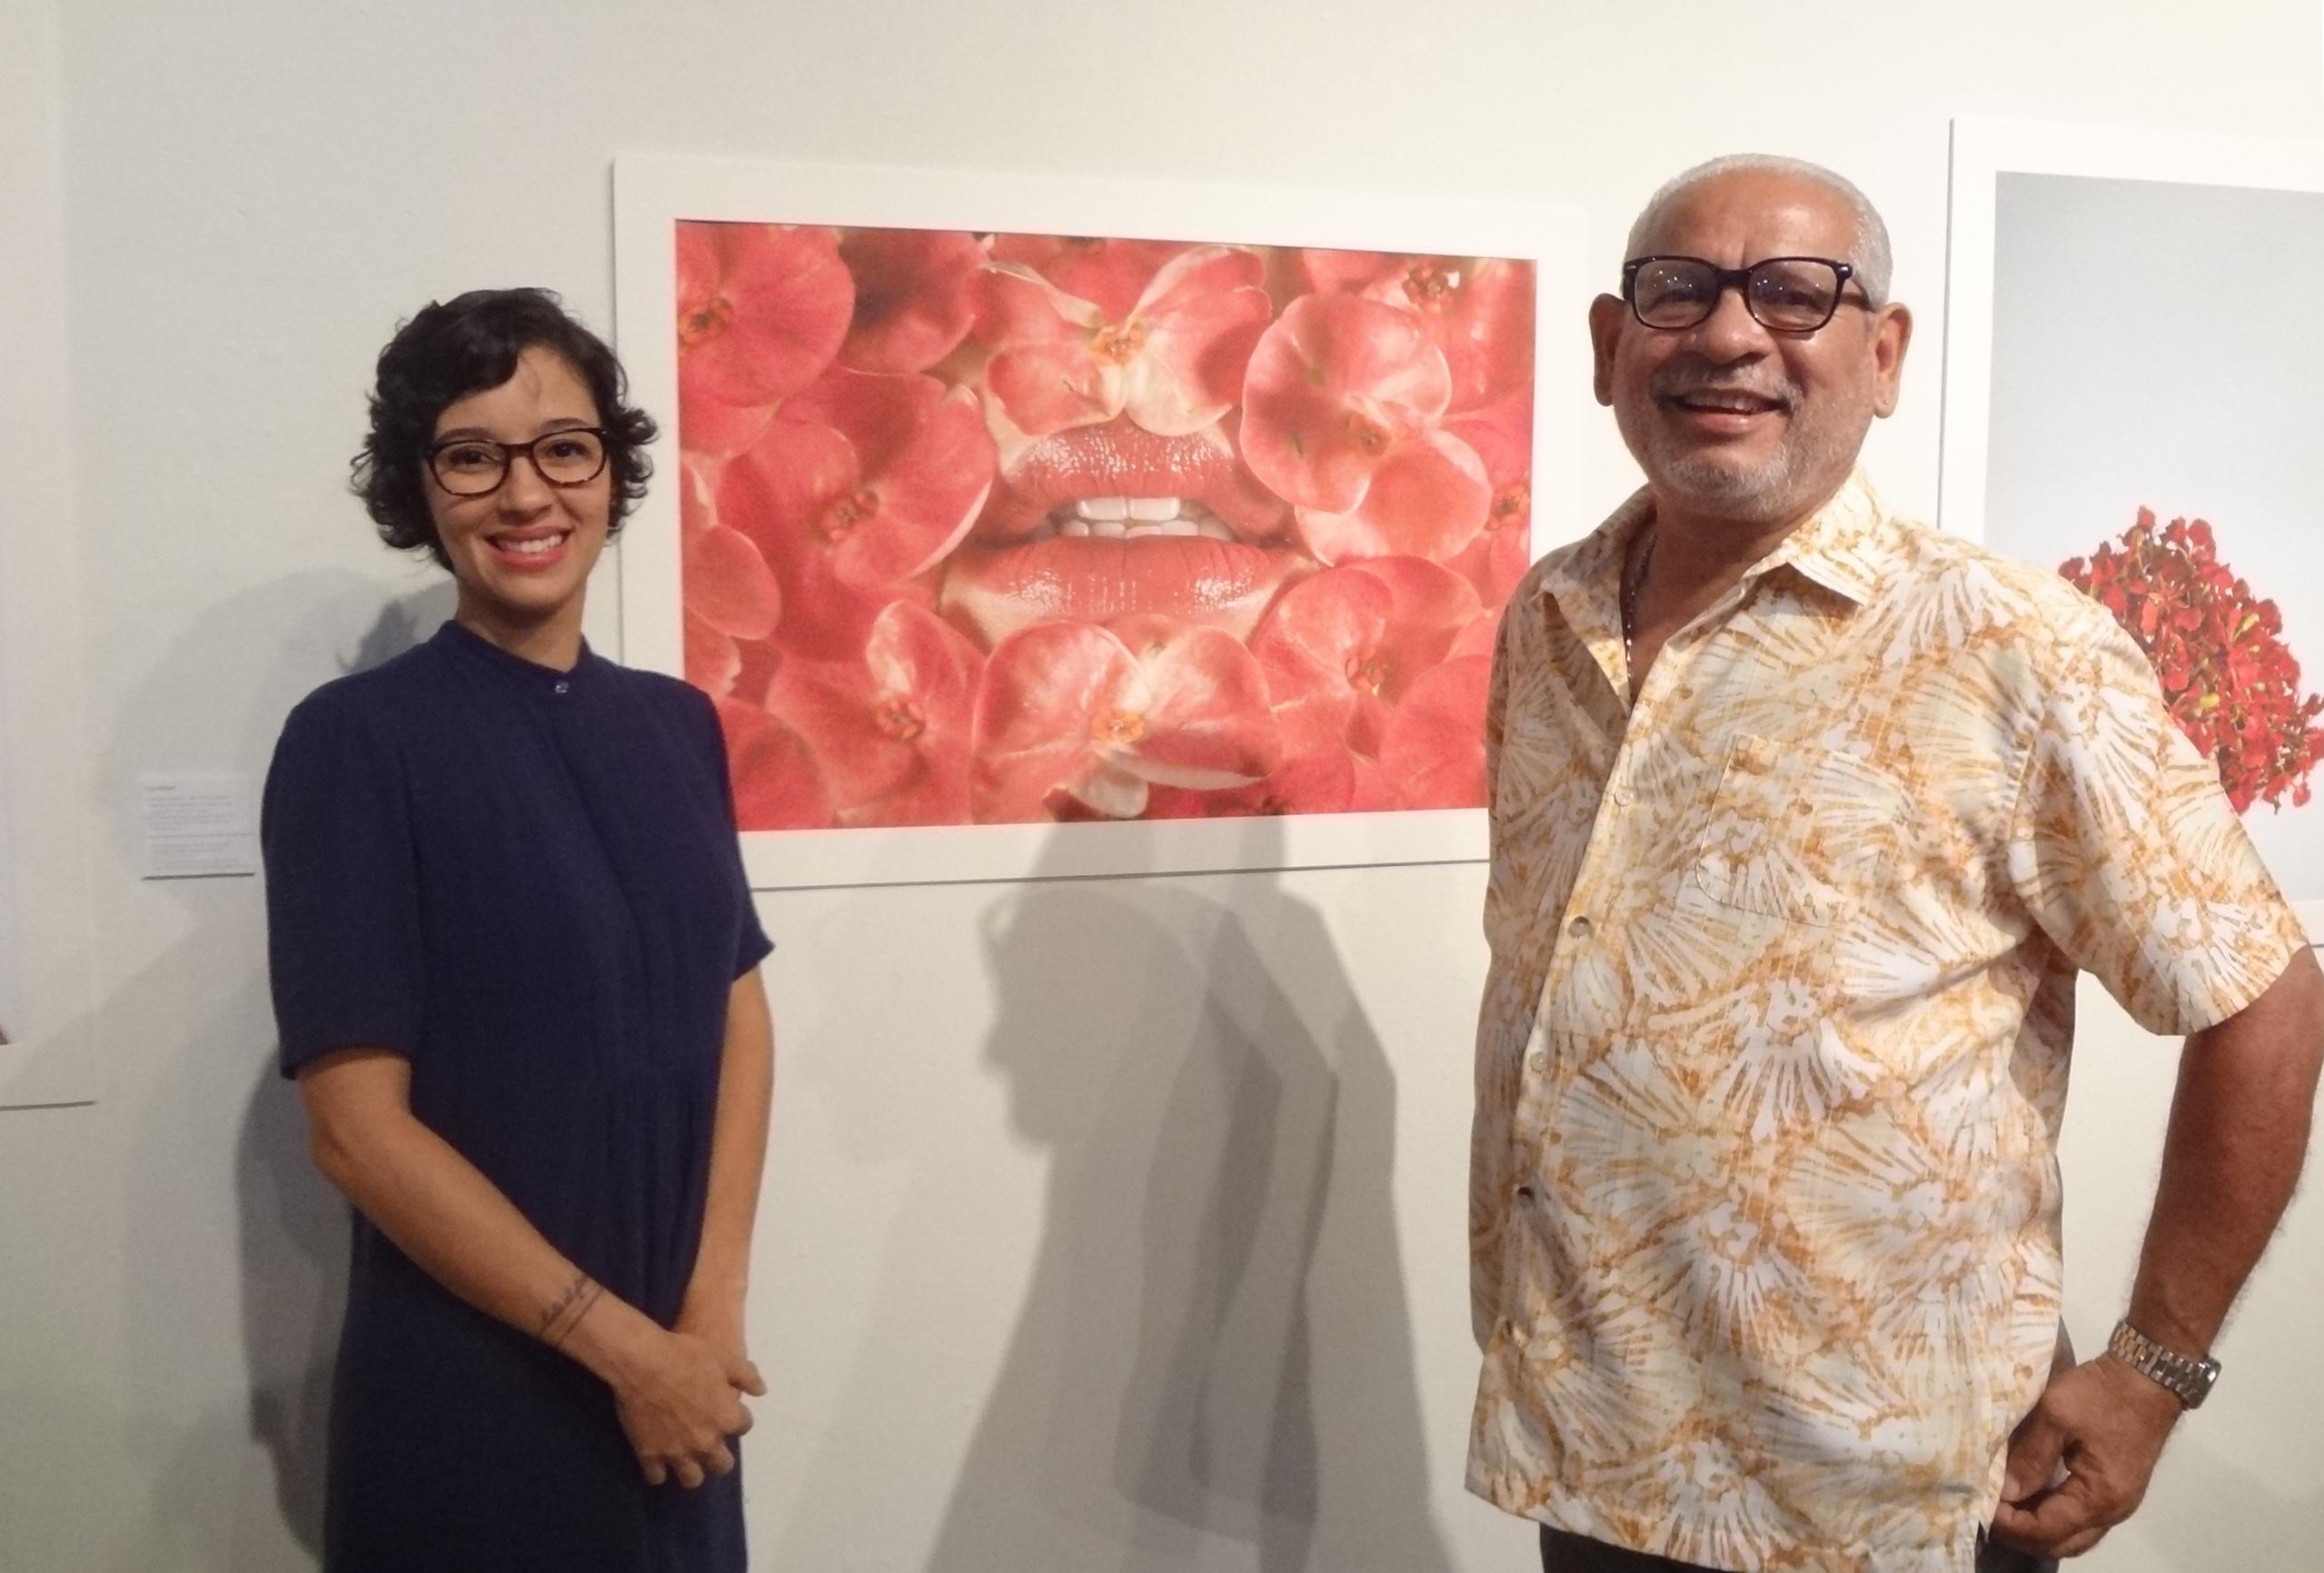 Zuania Muñiz junto al fotógrafo José Rodr;iguez del Taller de Fotoperidoismo. (Foto Adriana Pantoja)